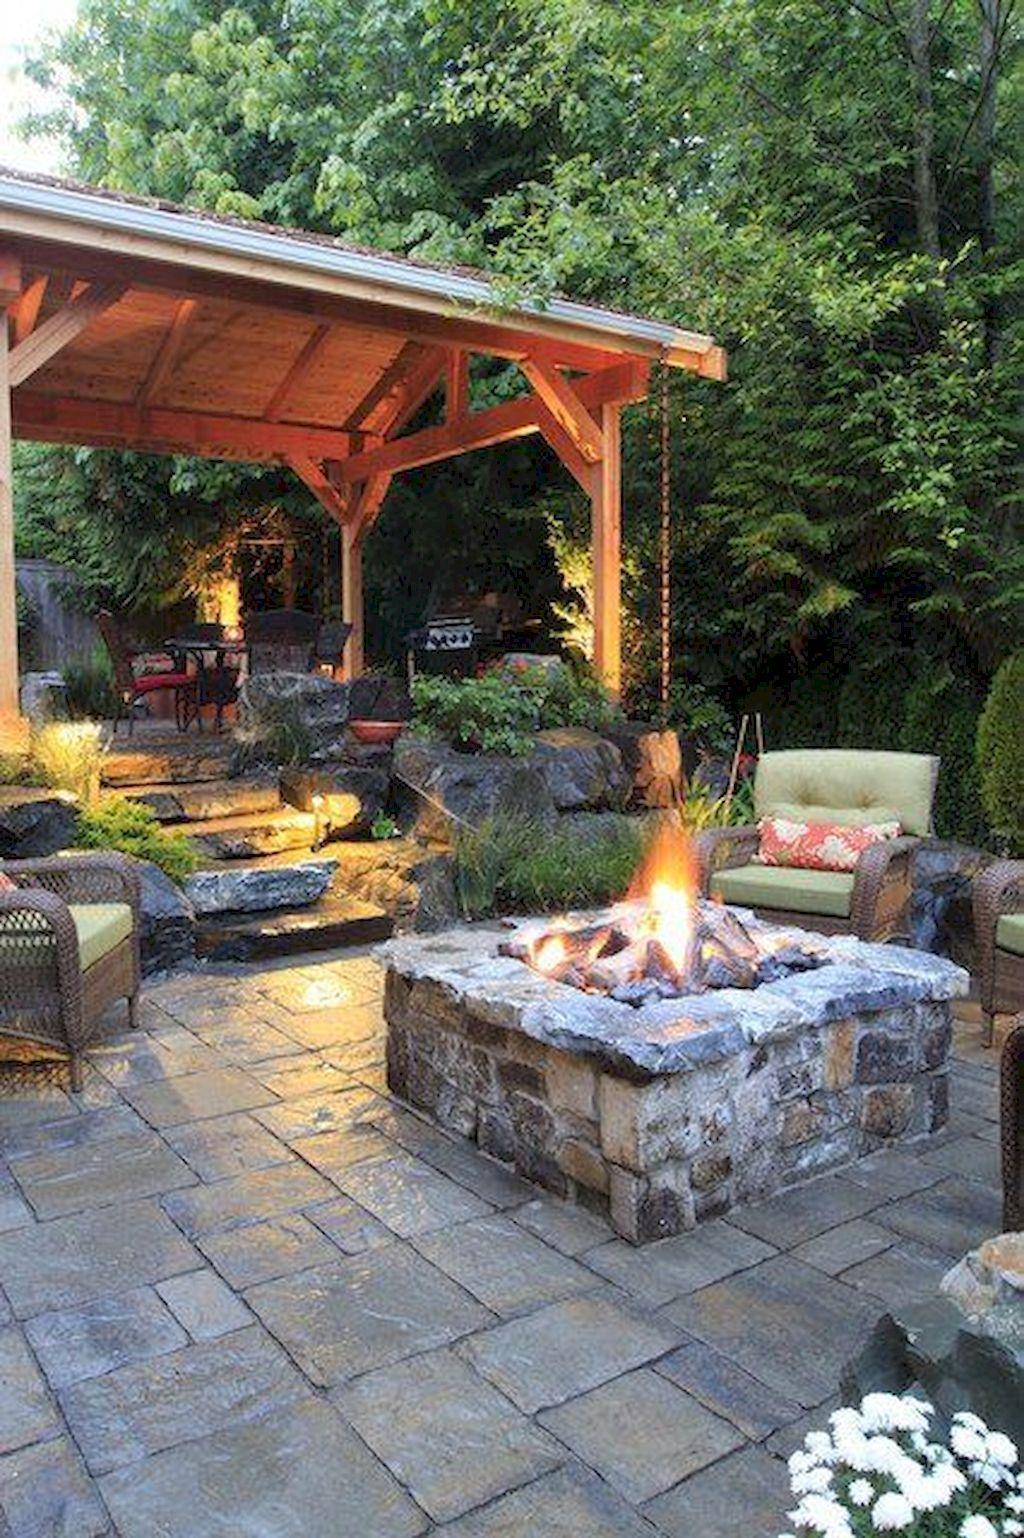 Backyard Fire Pit Laws Orange County Ca - House Backyards